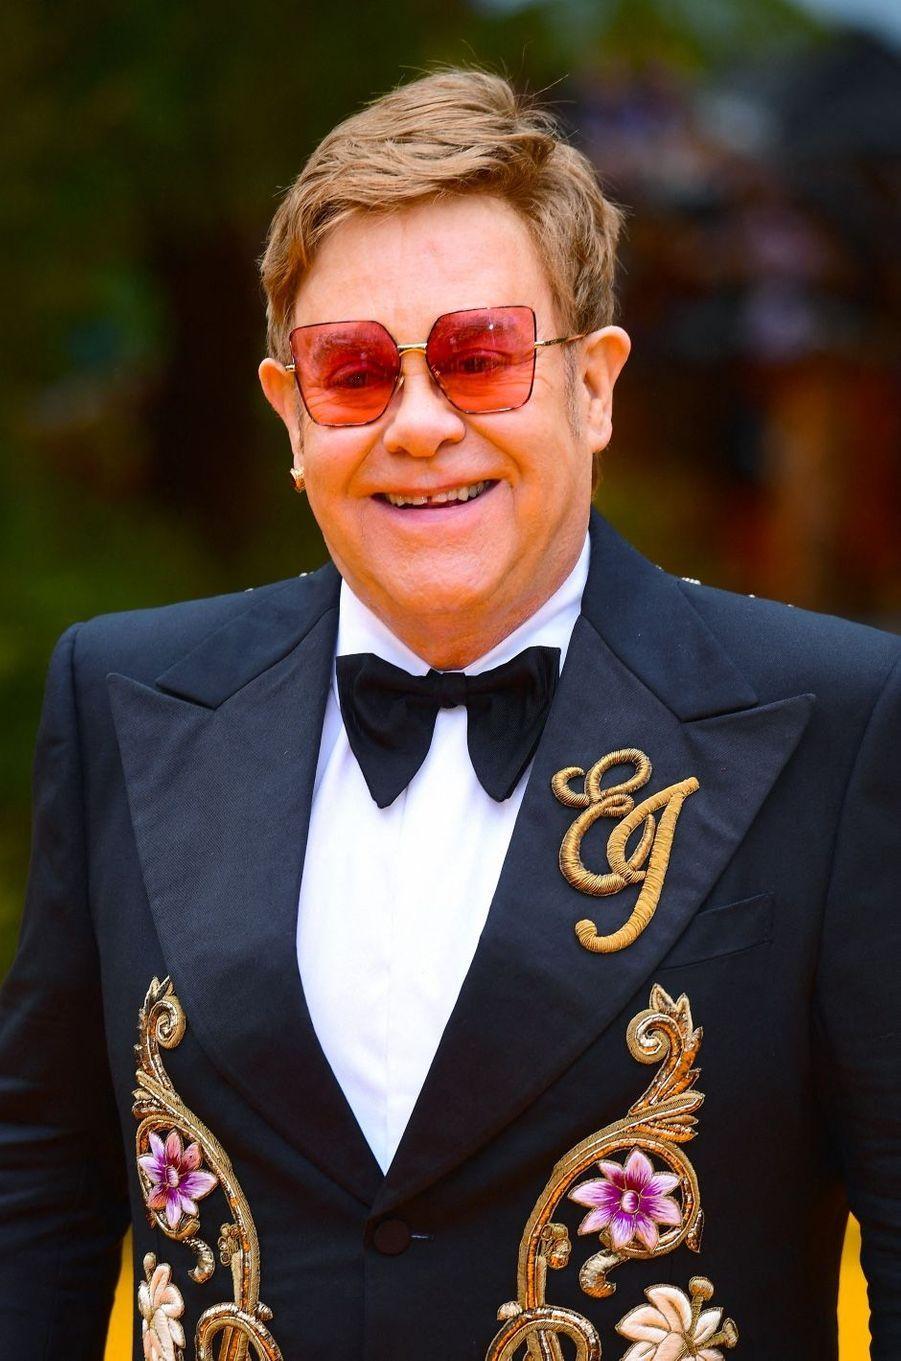 14 - Elton John, 81 millions de dollars.